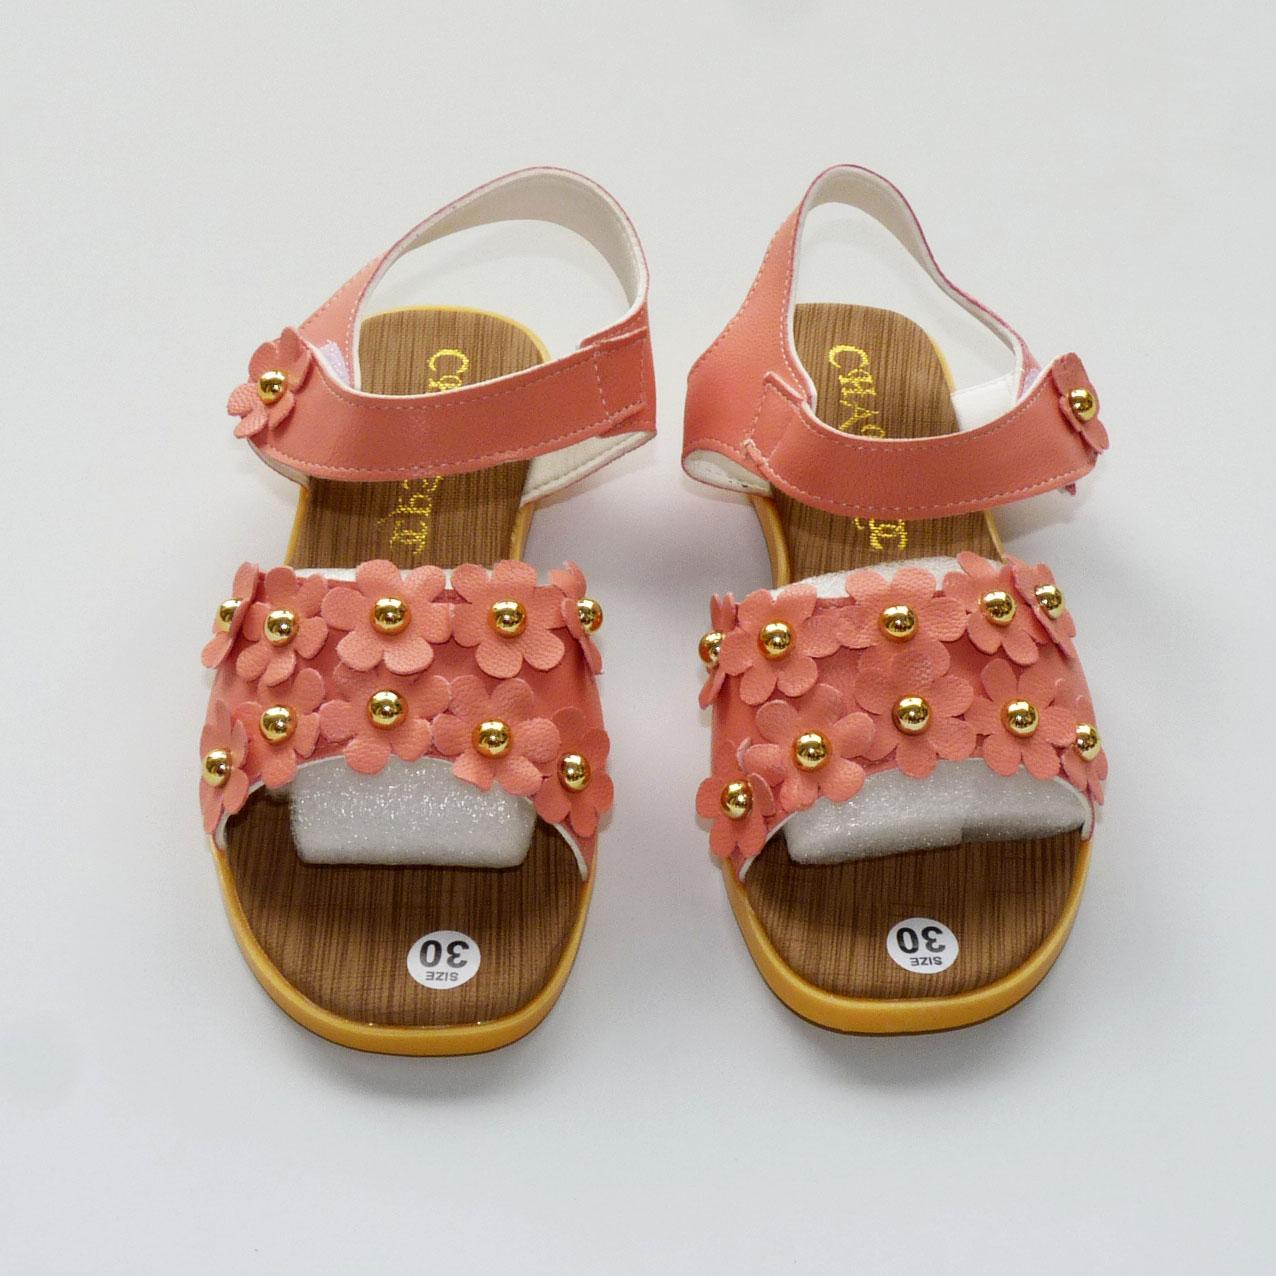 Giá bán Sandals Bé Gái trang trí hoa nhí